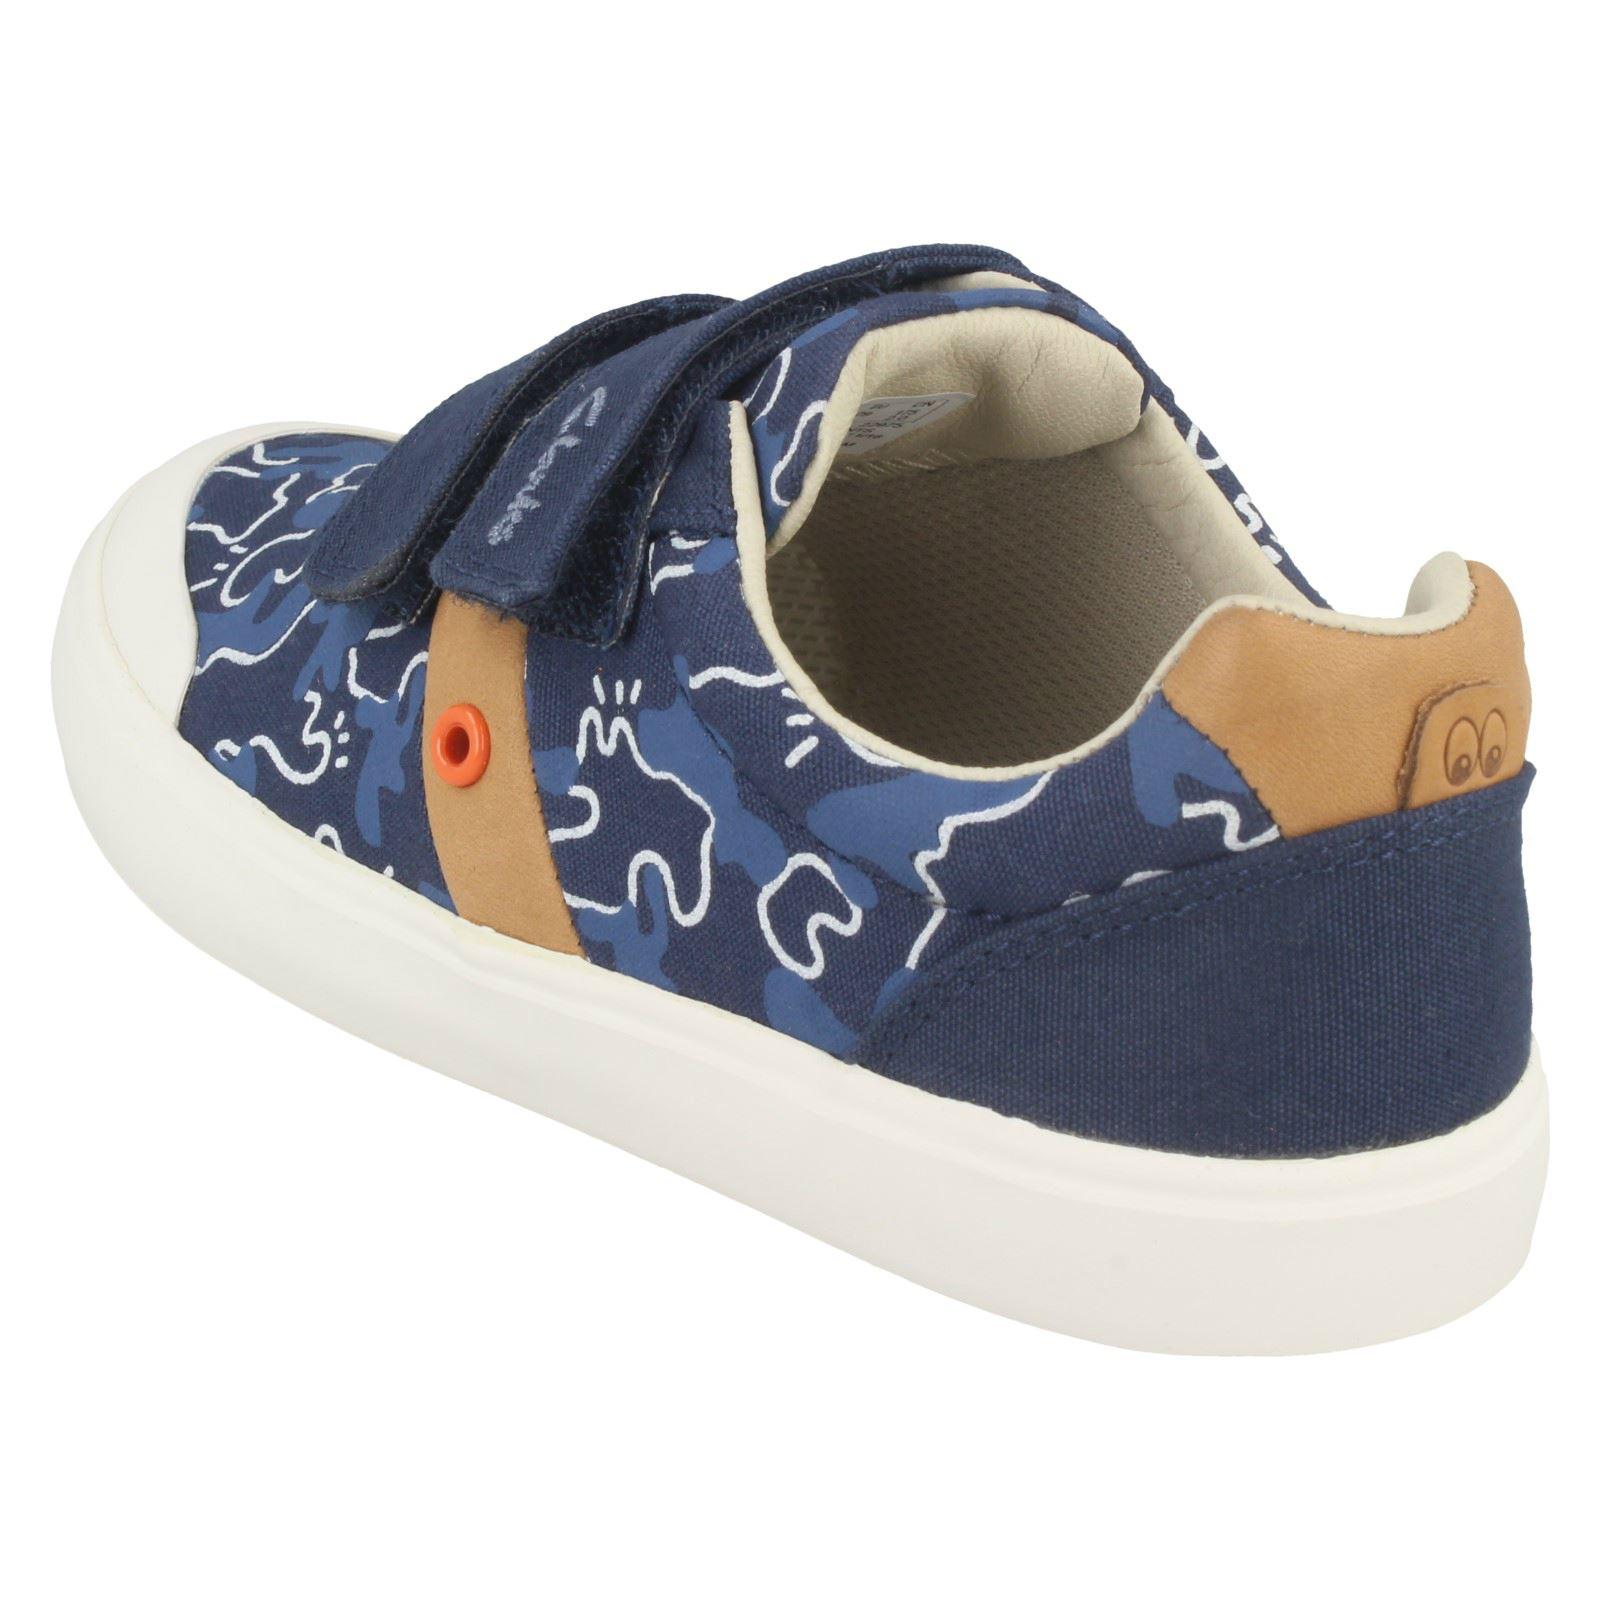 Boys Clarks Comic Zone Canvas Shoes